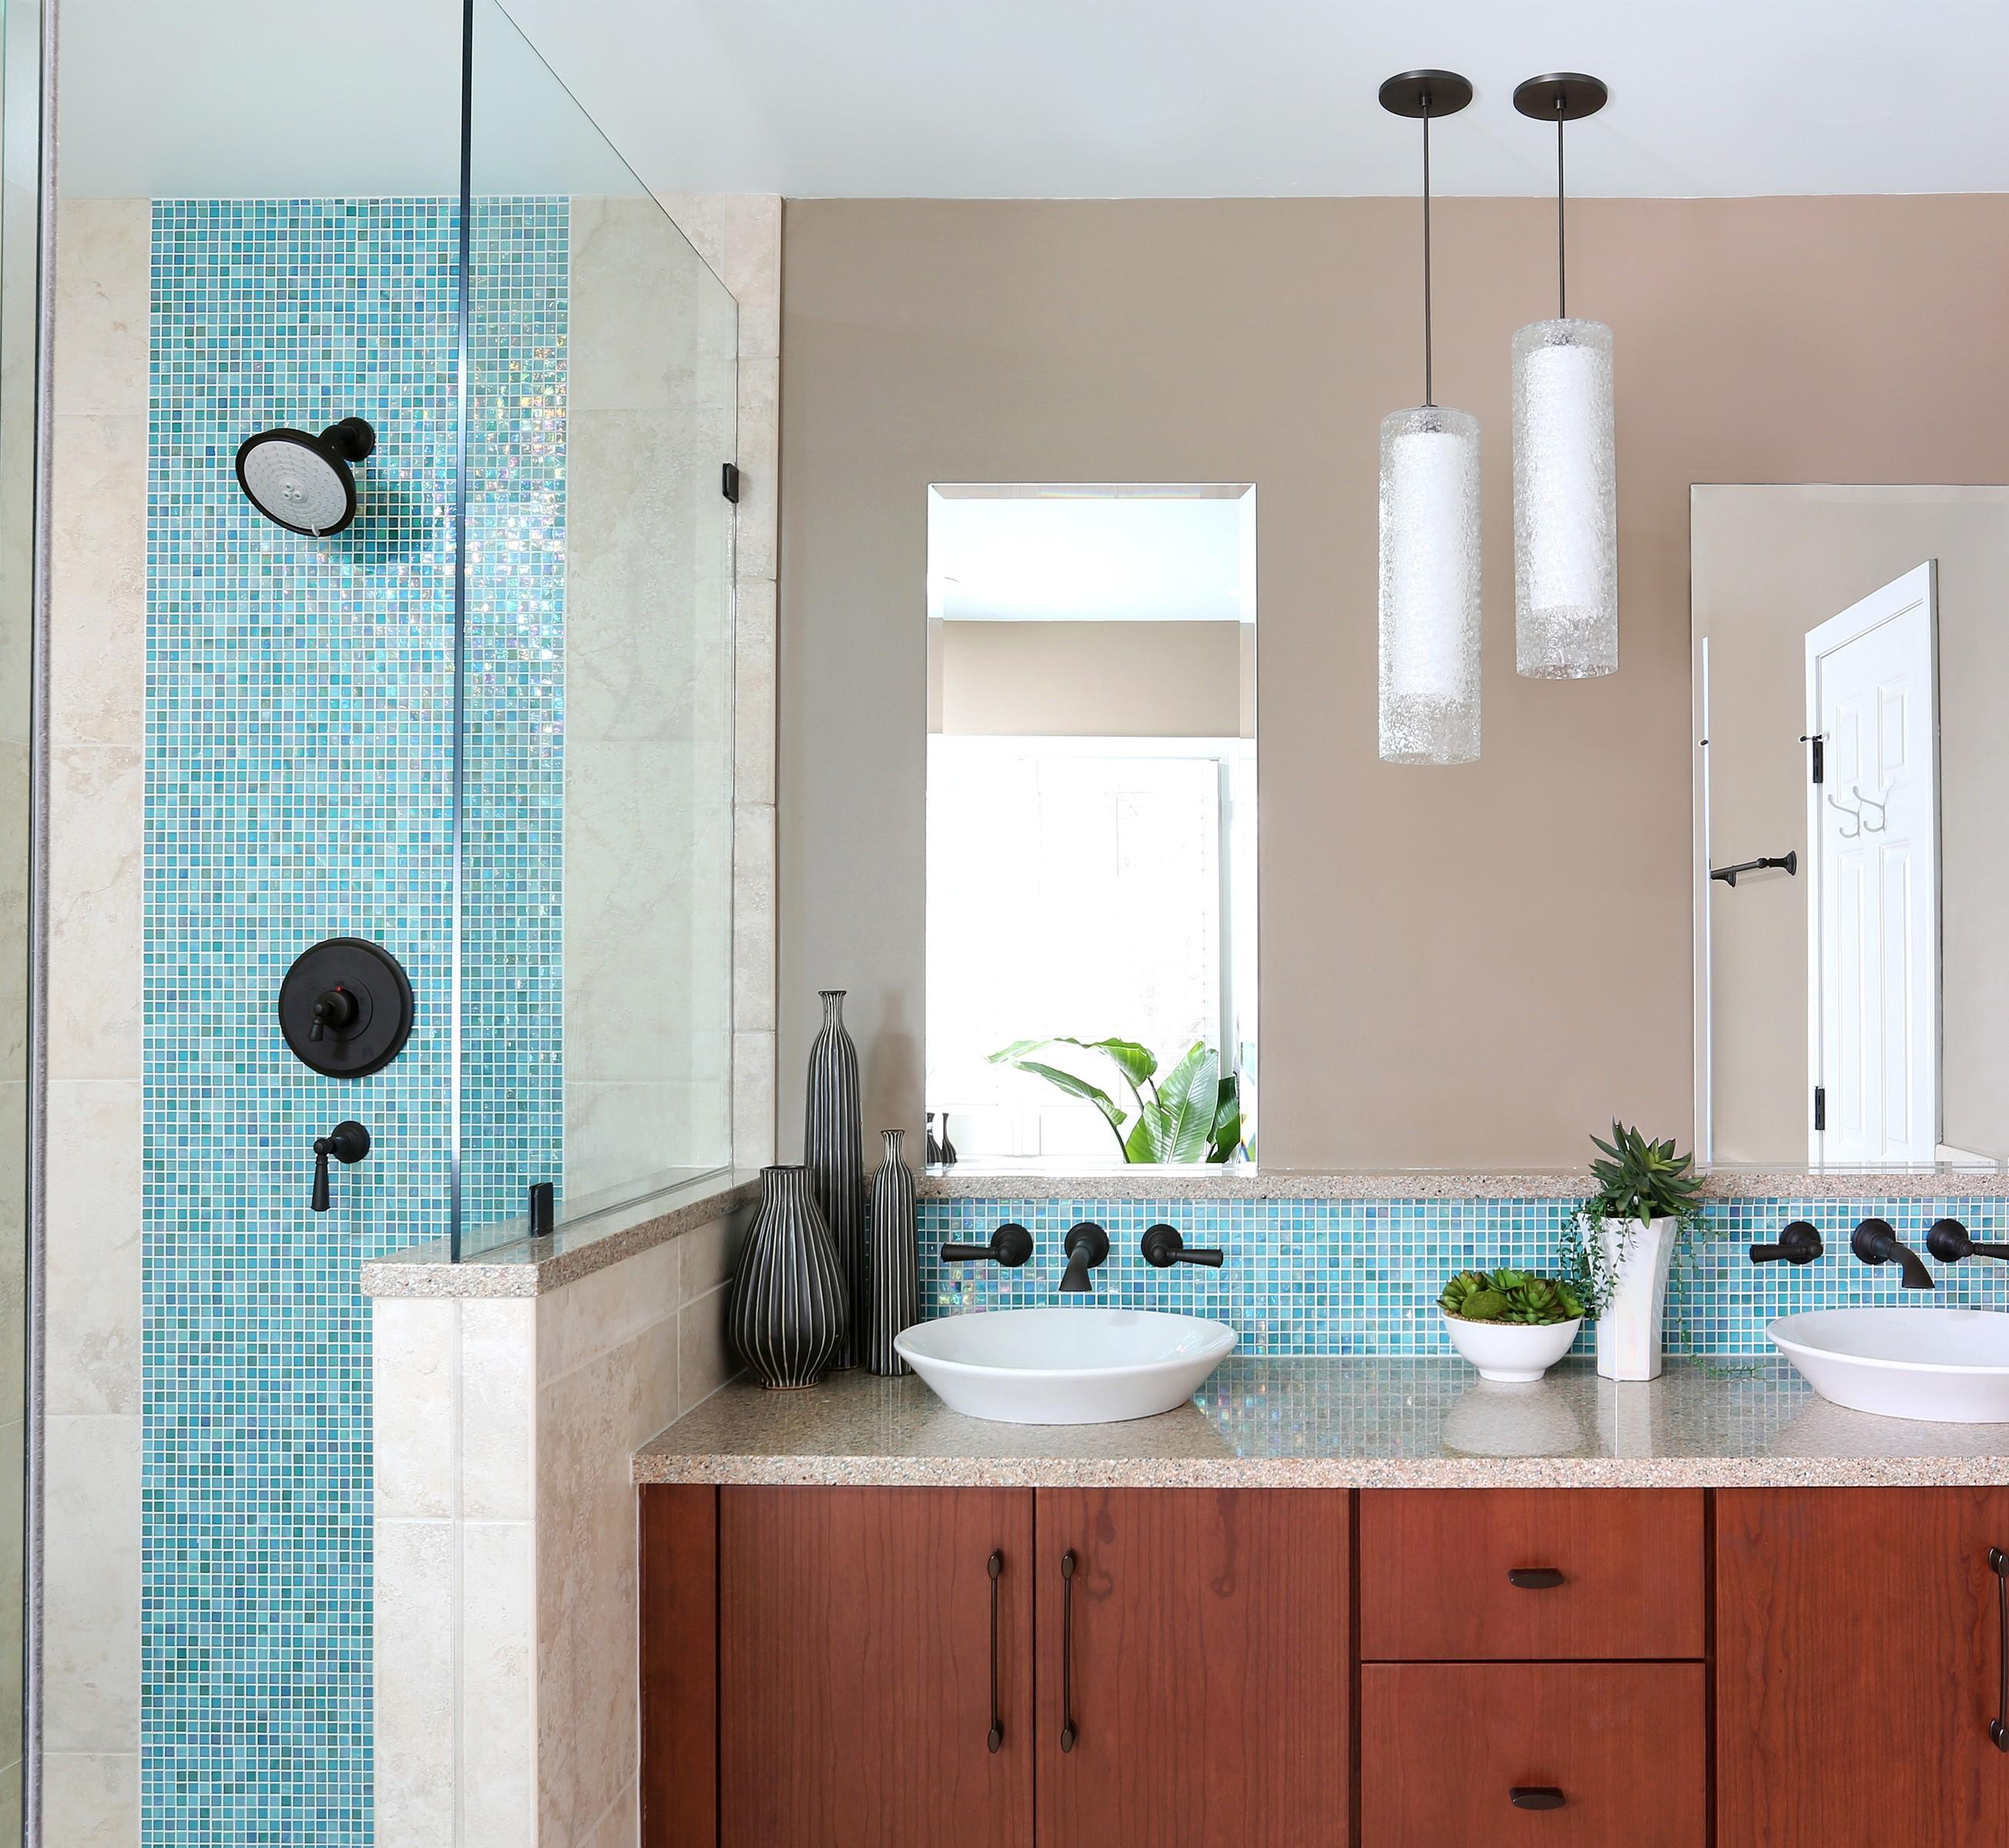 Bathroom with blue tiled shower